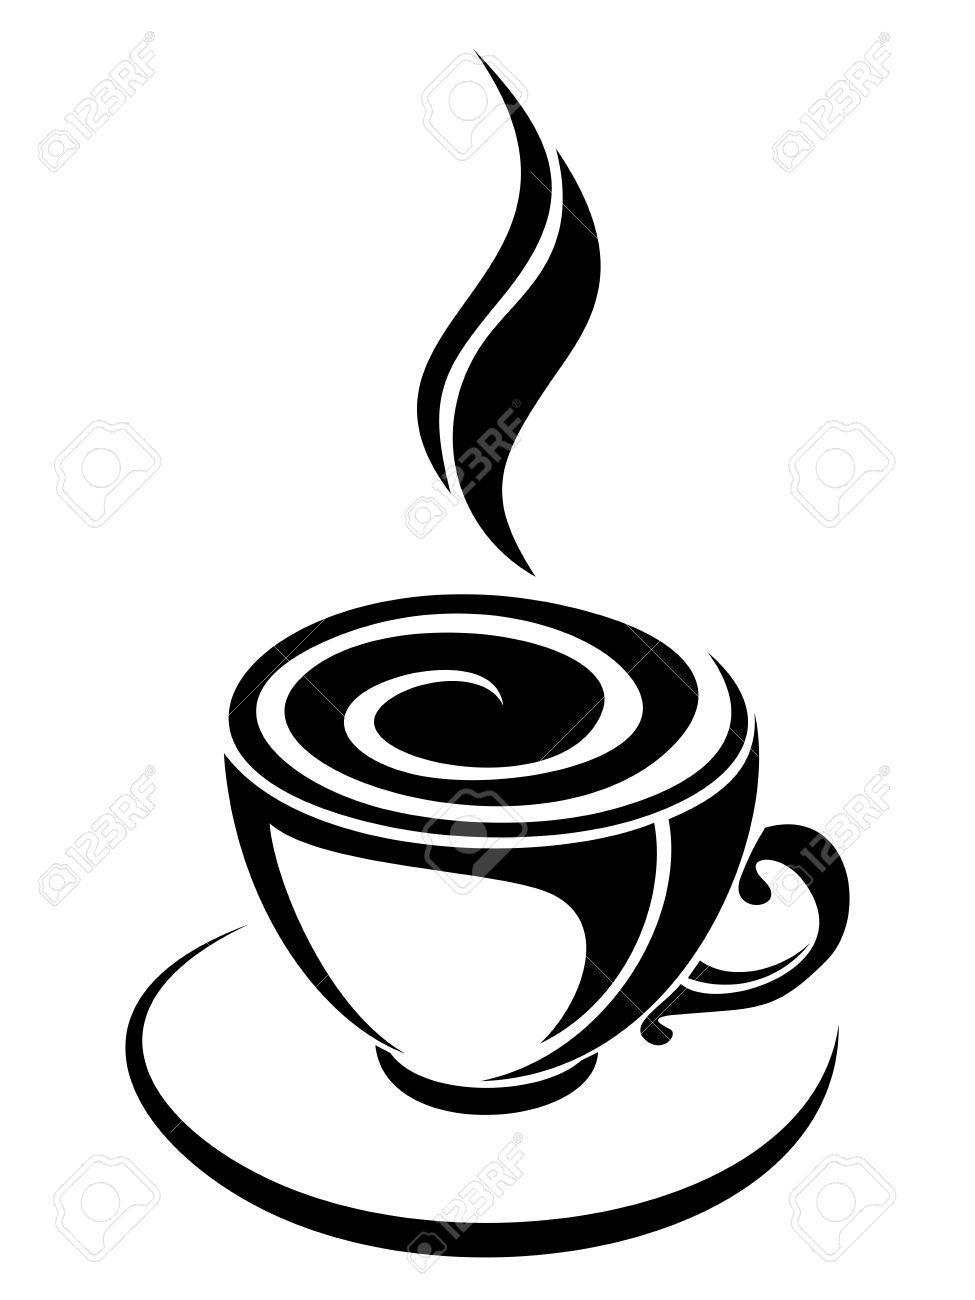 coffee silhouette.